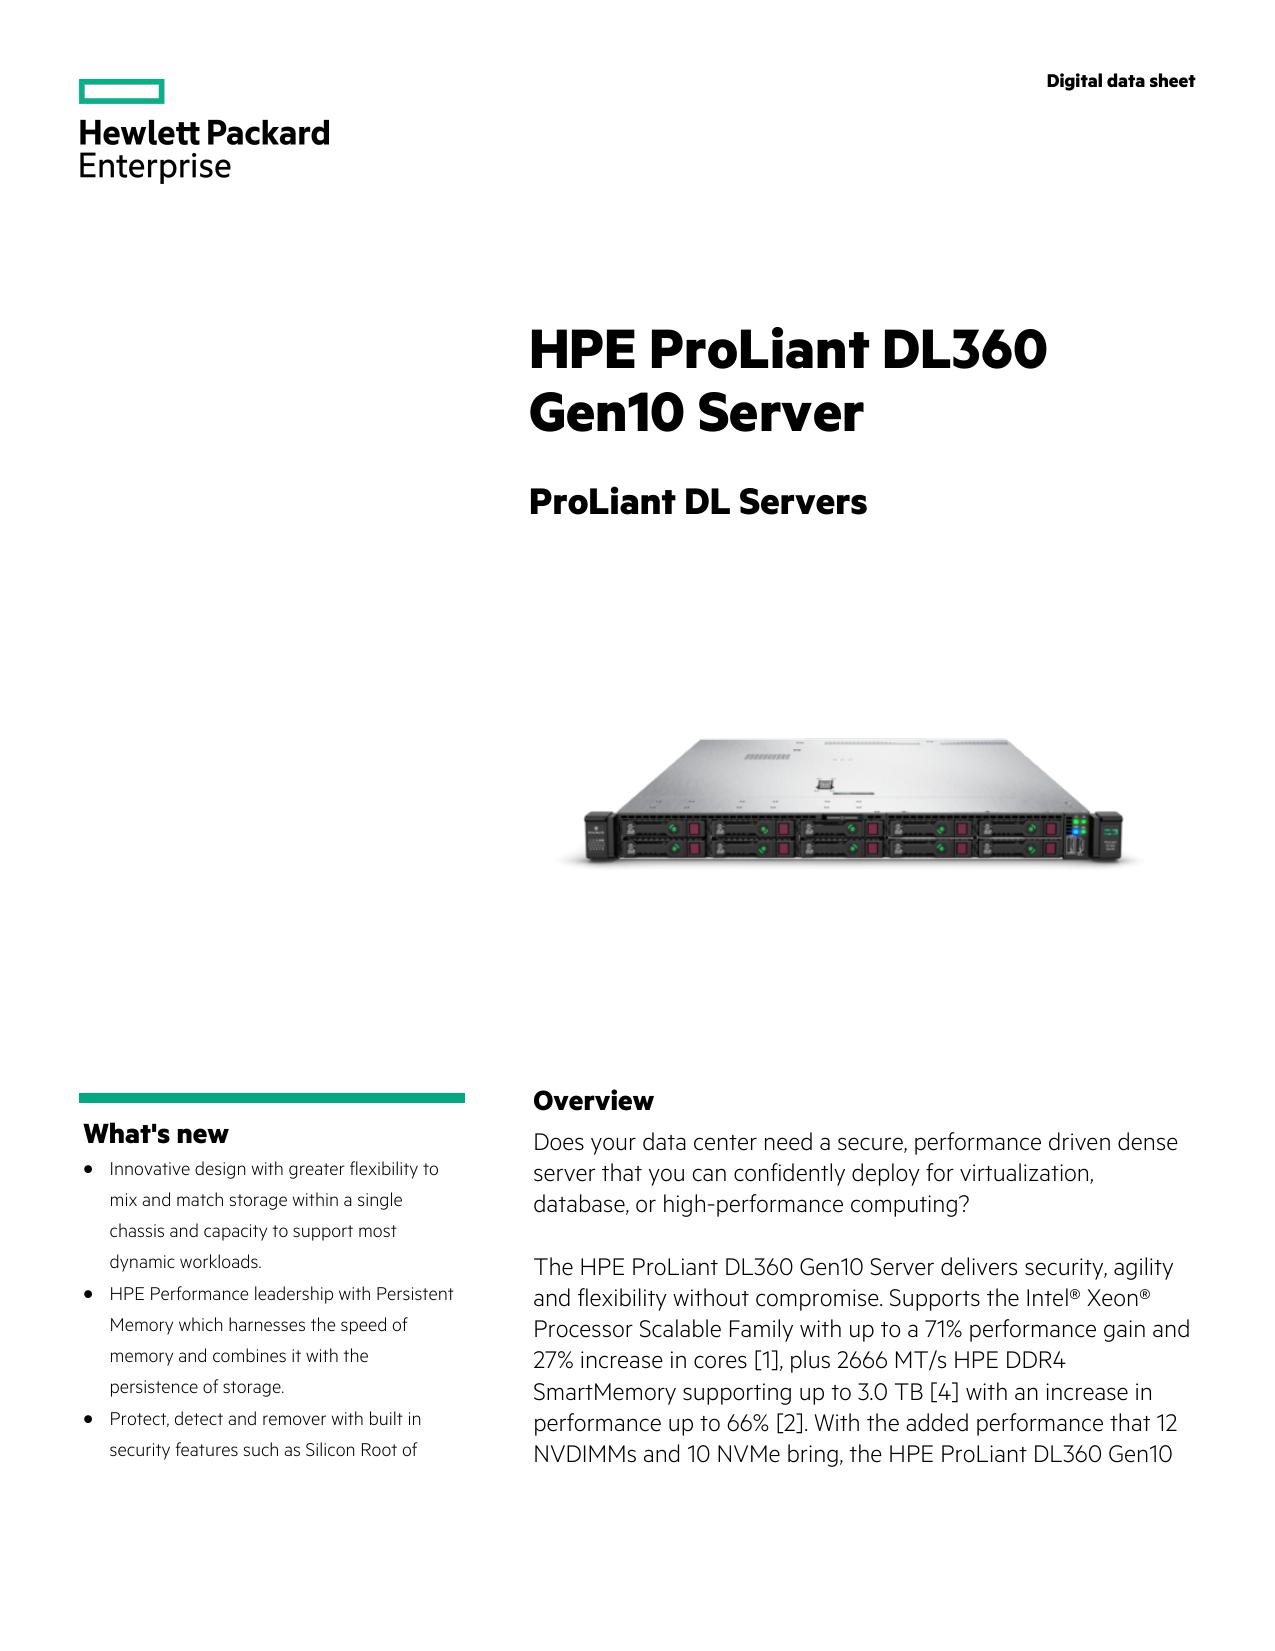 HPE ProLiant DL360 Gen10 Server Digital data sheet   manualzz com